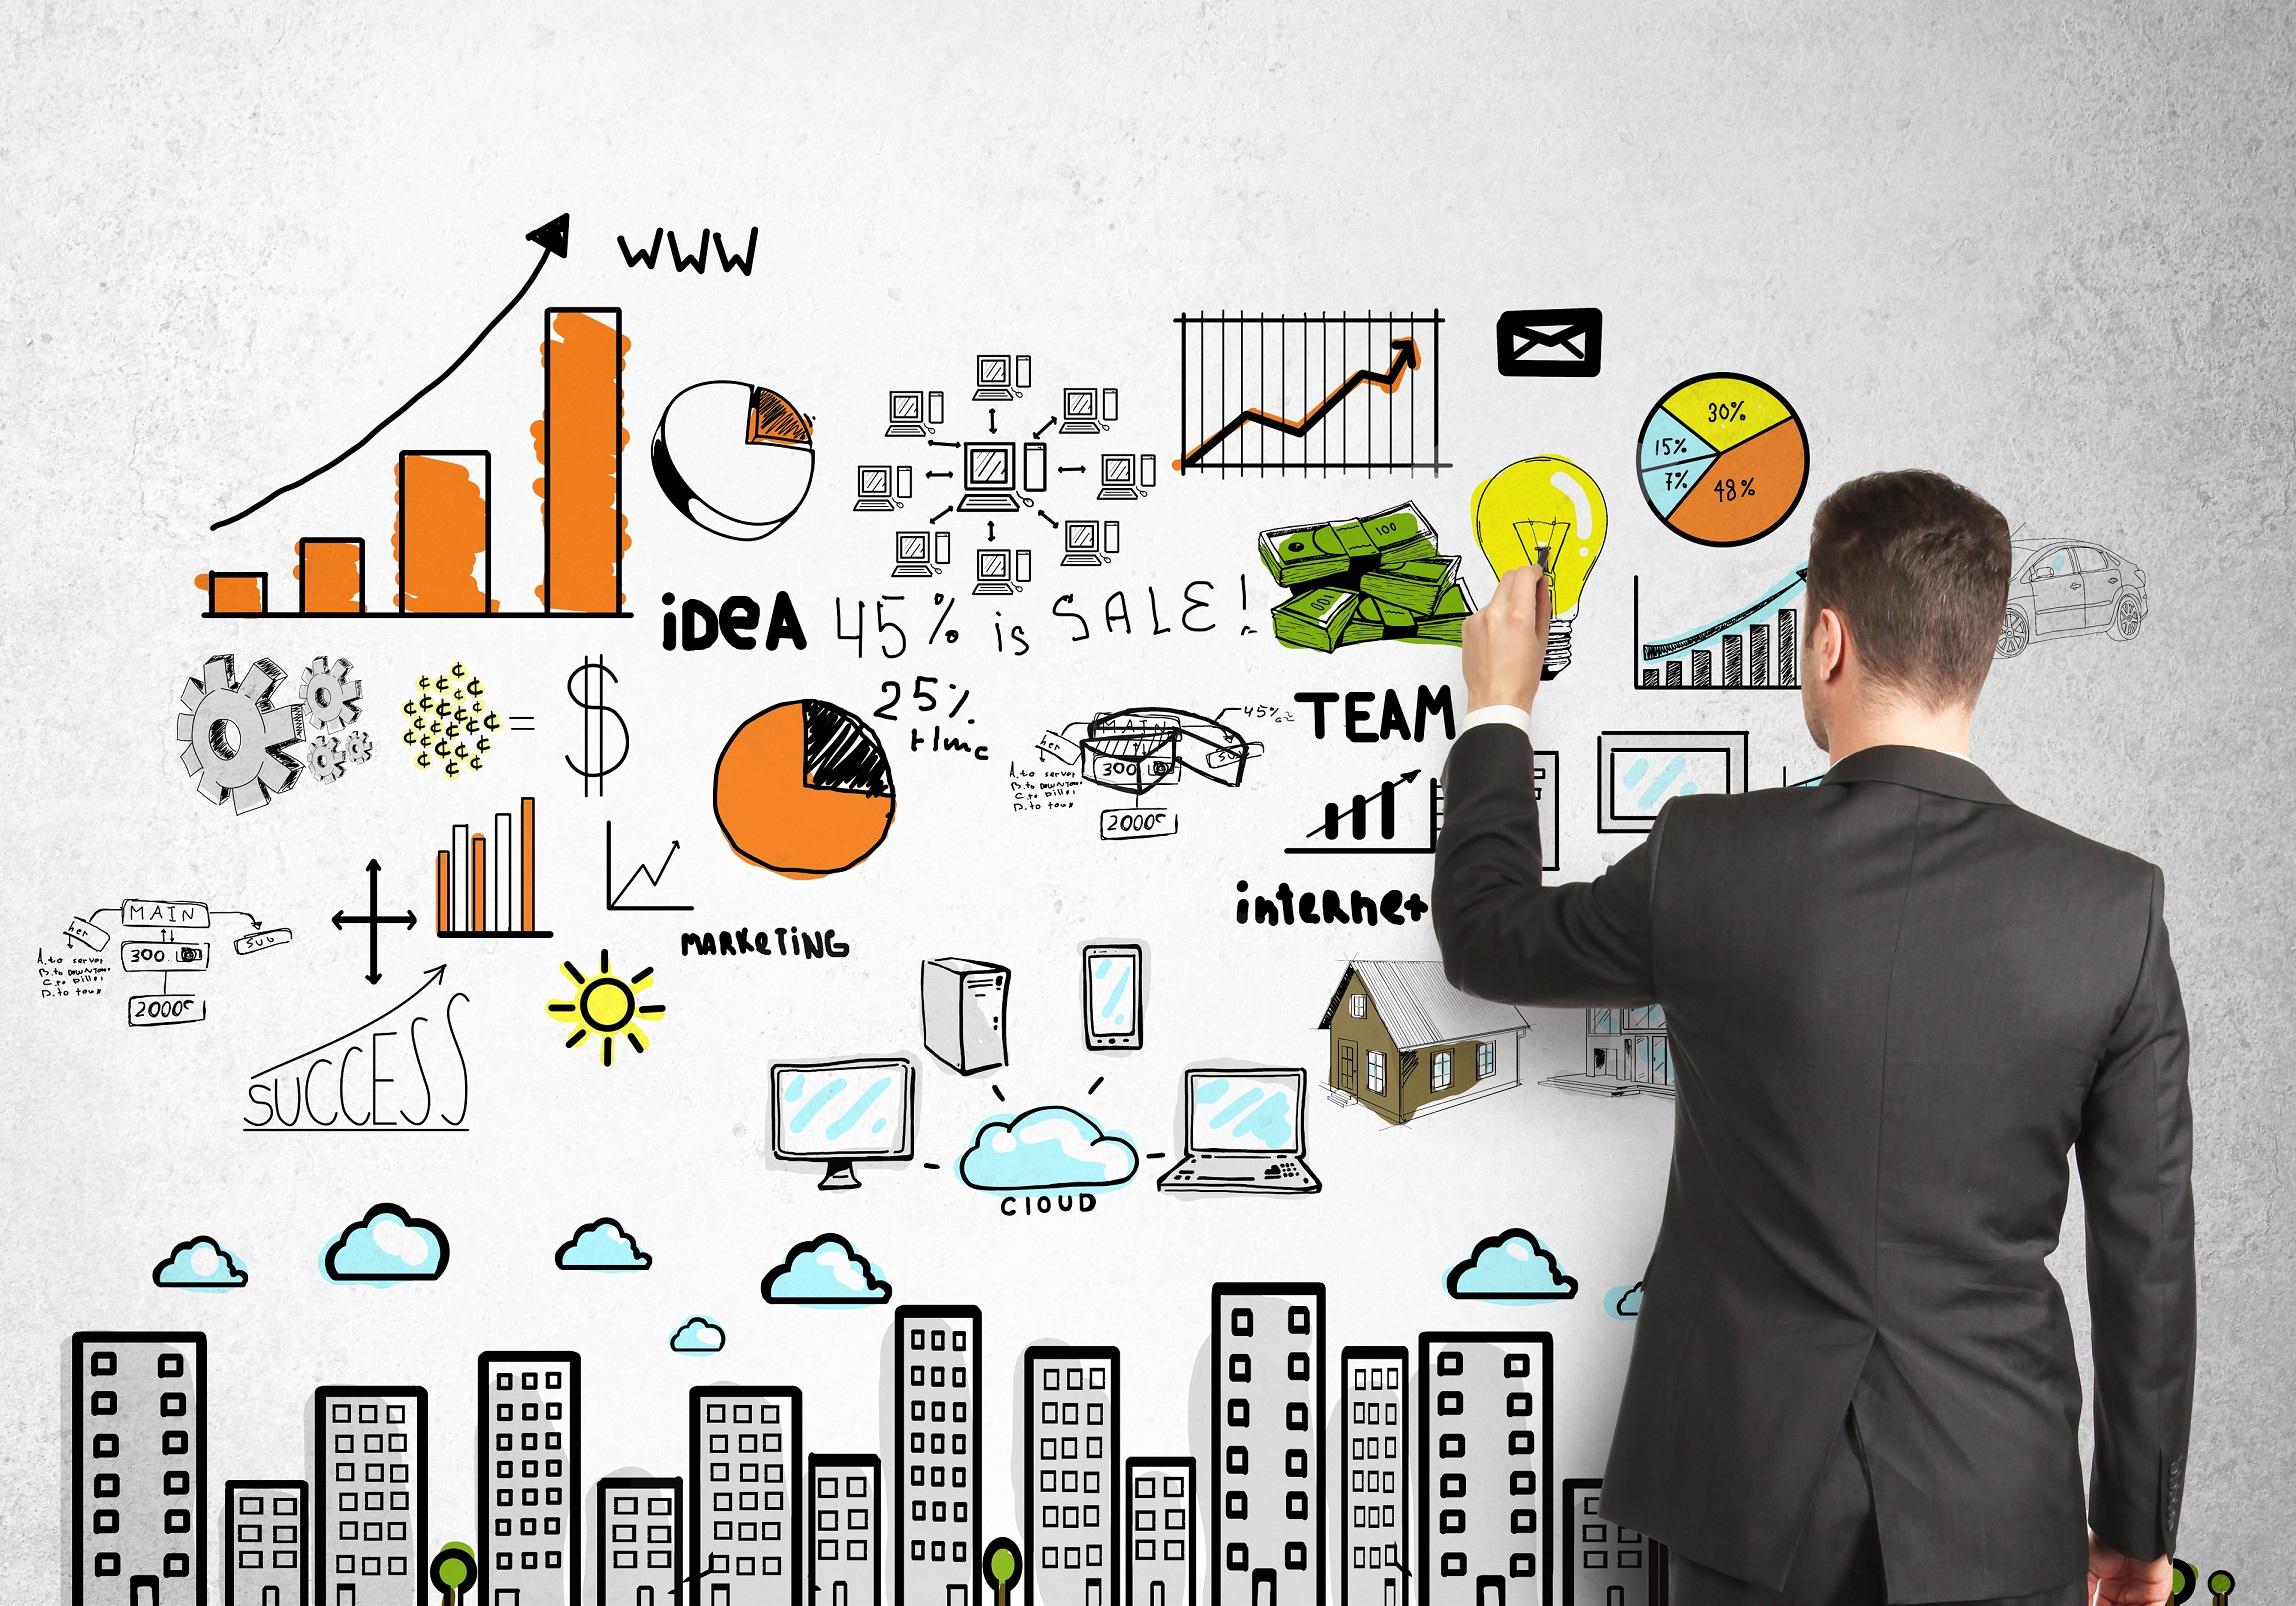 regarda: http://shapetechmarketing.com/in-marketing-perception-is-reality/